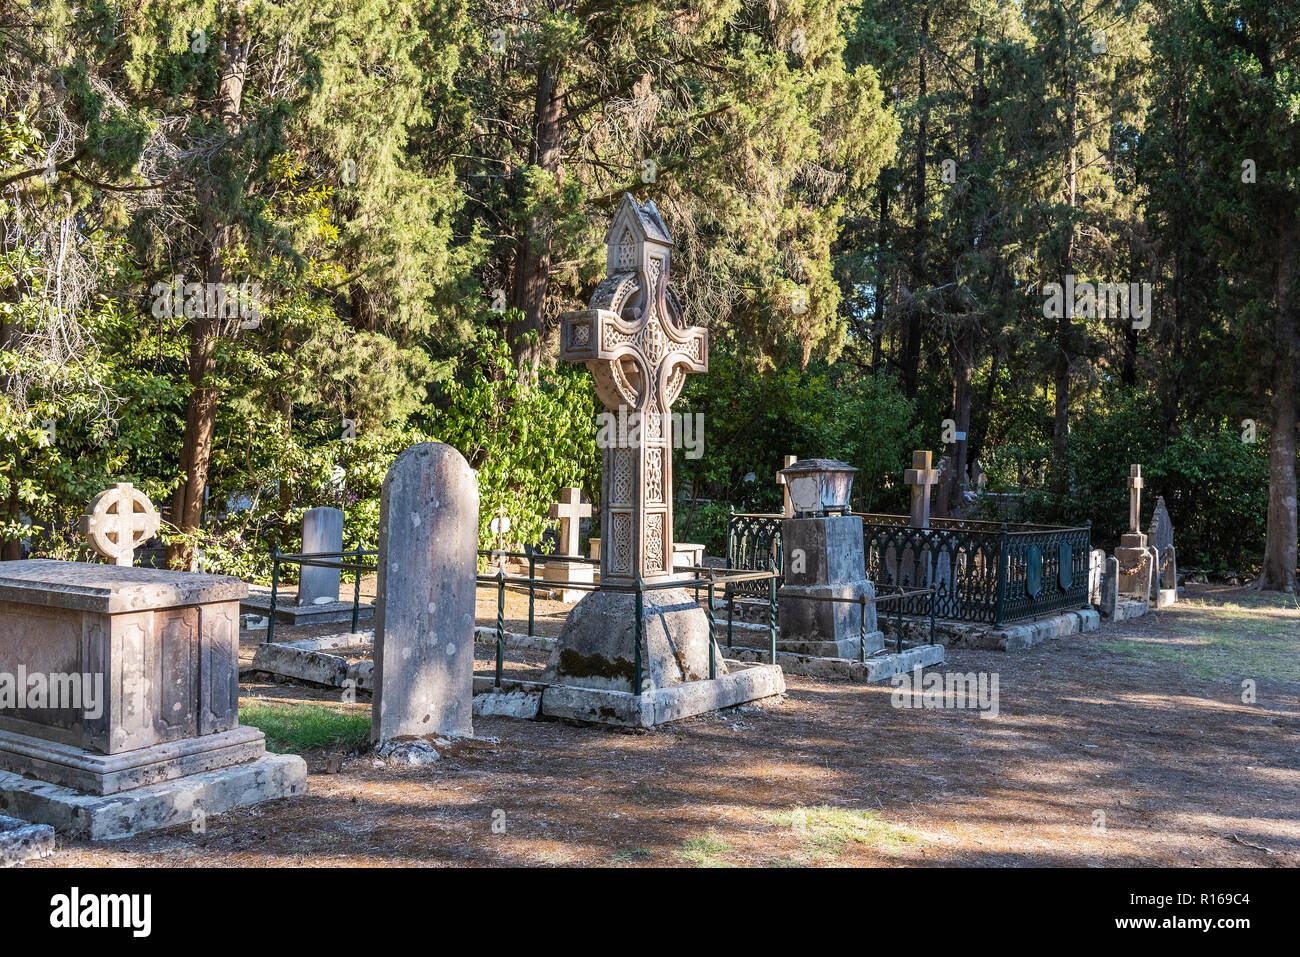 Gravesites, British cemetery, Kerkyra, Corfu Island, Ionian Islands, Greece - Stock Image